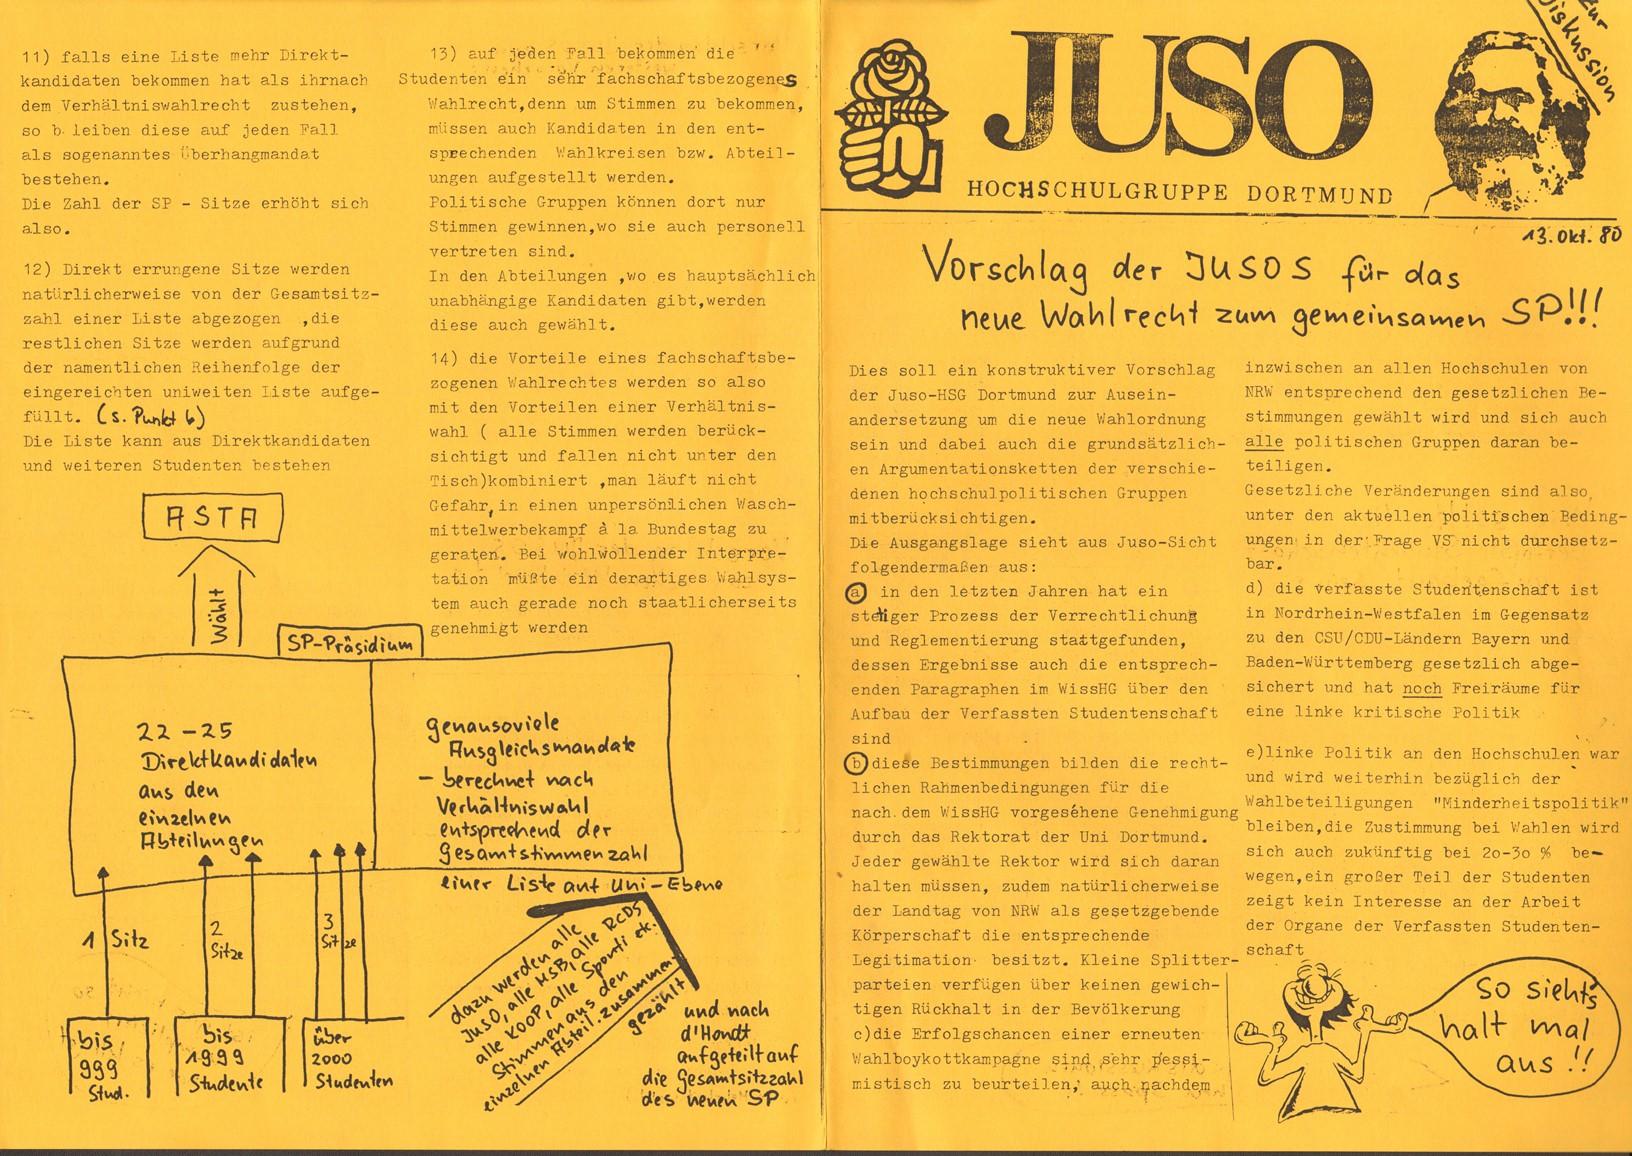 Dortmund_JUSO_HSG_1980_002_01